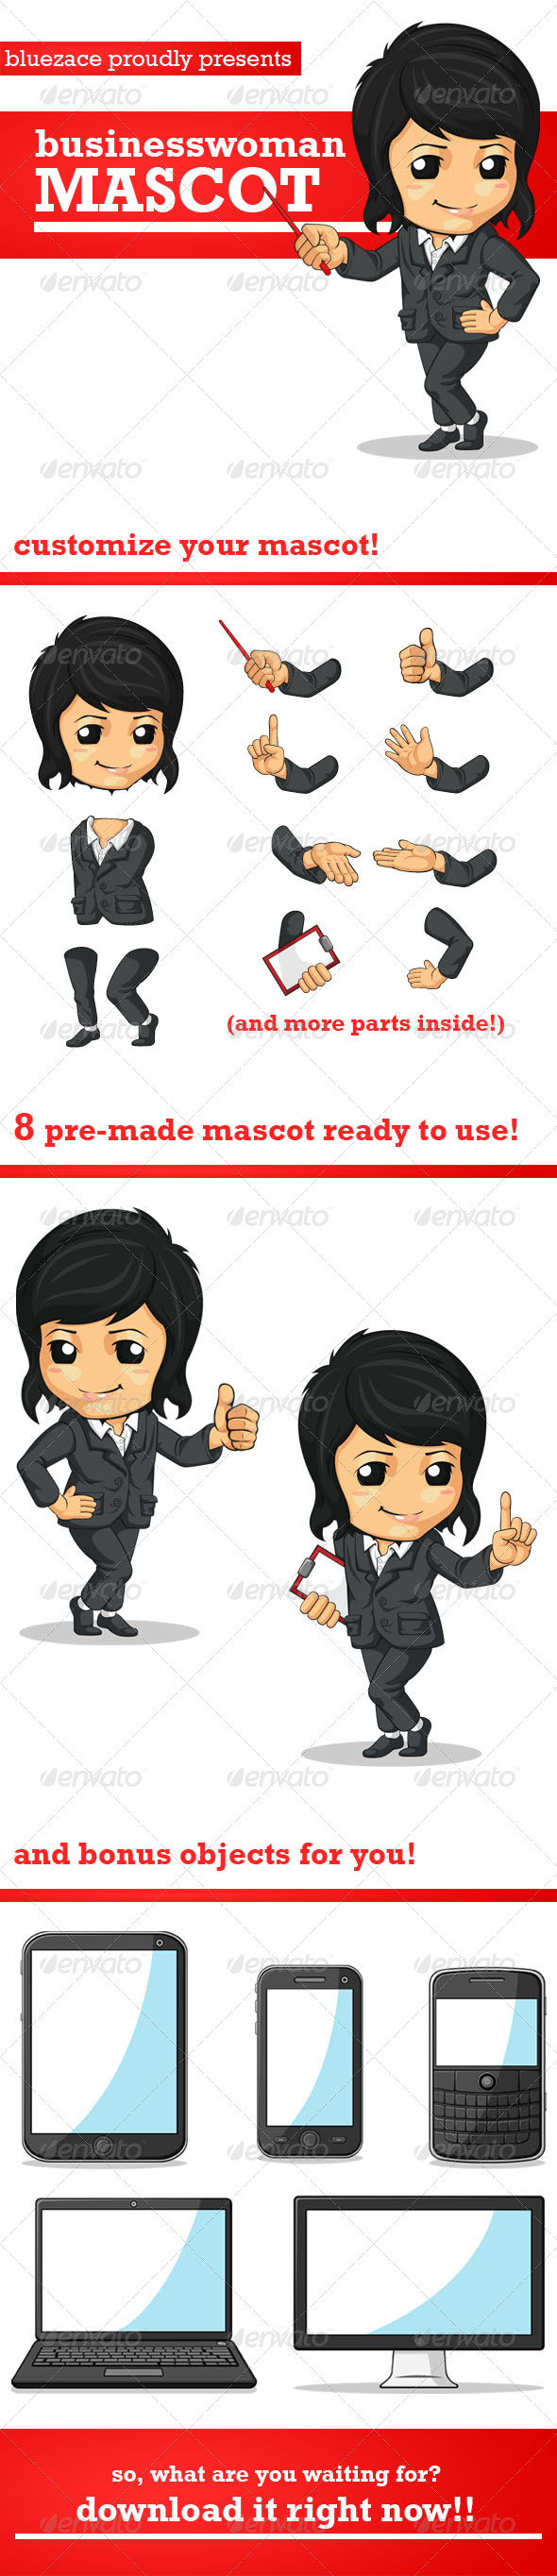 GraphicRiver Business Woman Mascot 4052740